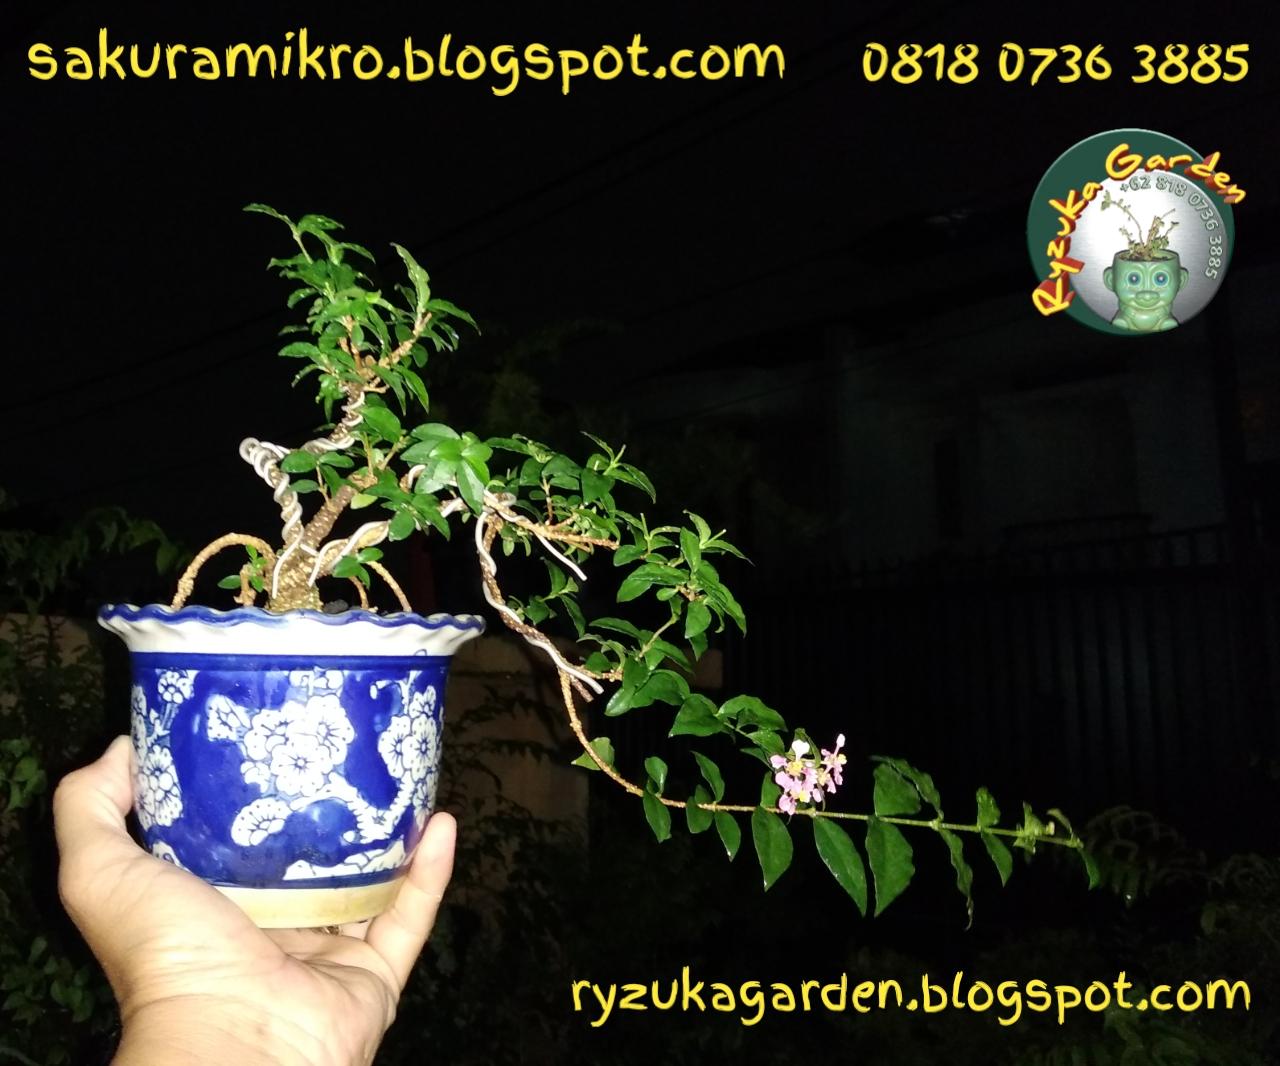 Sakura Mikro Sakura Micro Jual Bonsai Sakura Mikro